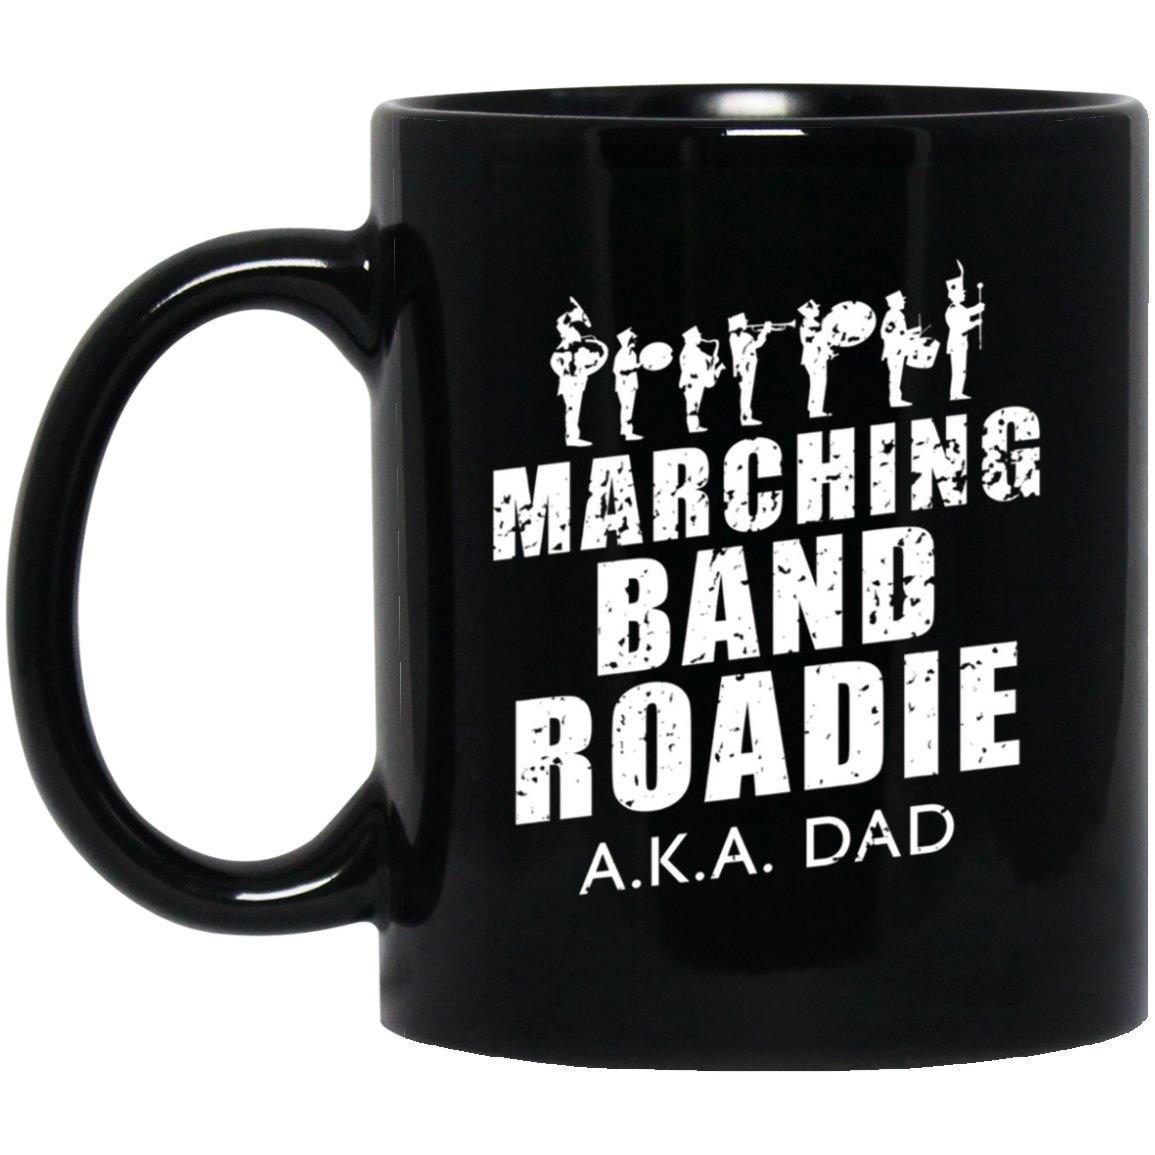 Mens Marching Band Roadie A.K.A. Dad Funny Gift Black  Mug Black Ceramic 11oz Coffee Tea Cup